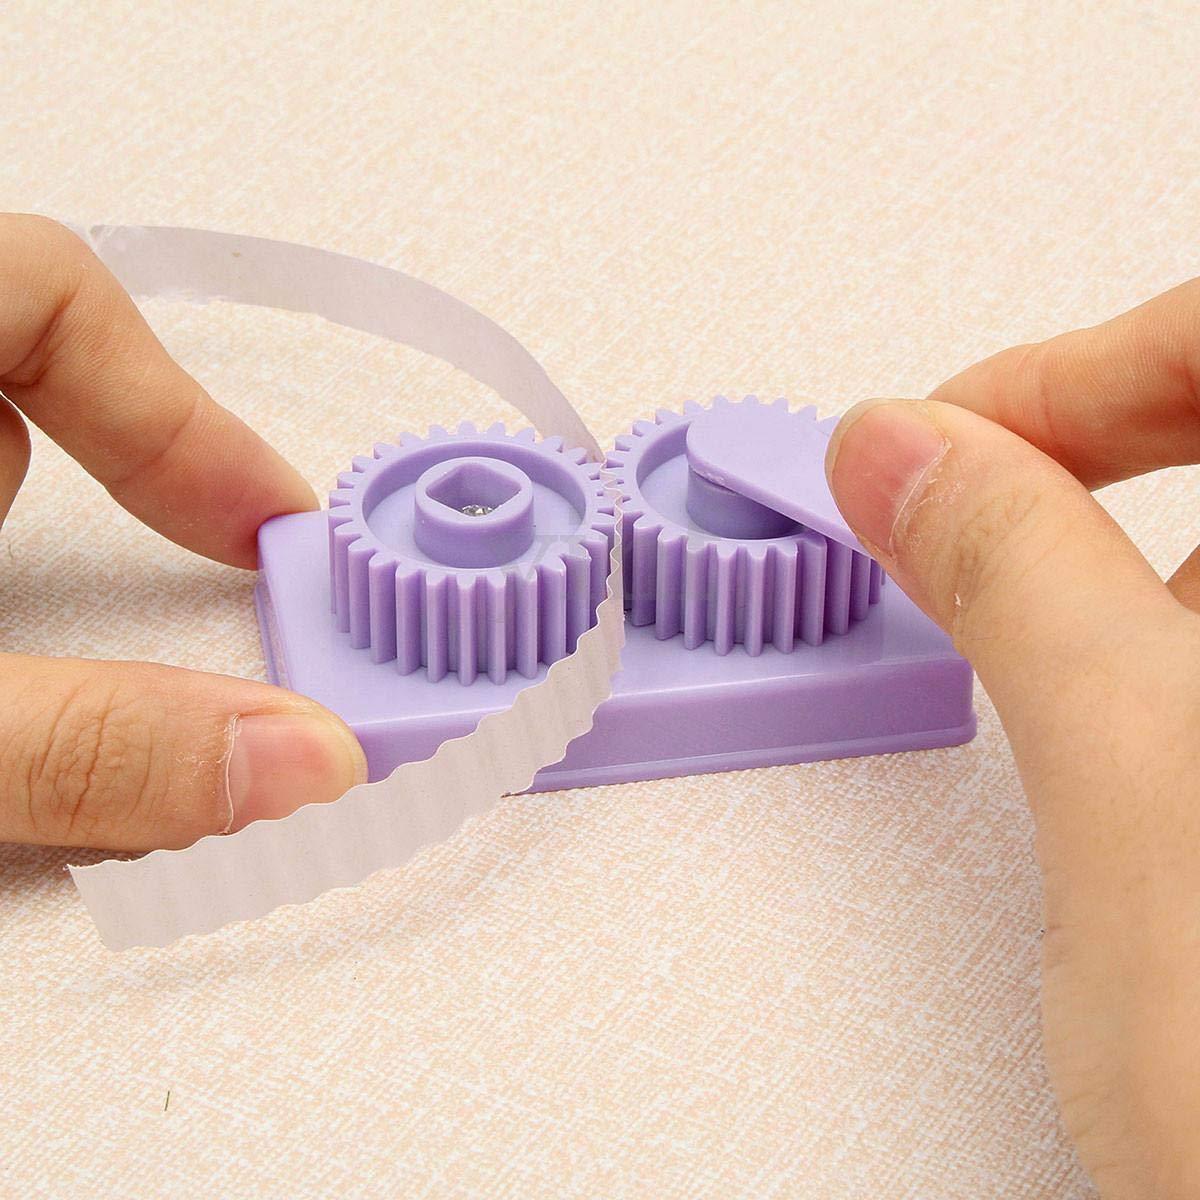 Carta Slip Wave Shaper Making Tool Carta Quilling Papercraft Origami Craft DIY Quilling Forniture Handmade Decor Yosoo Paper Crimper Crimping Tool Blue